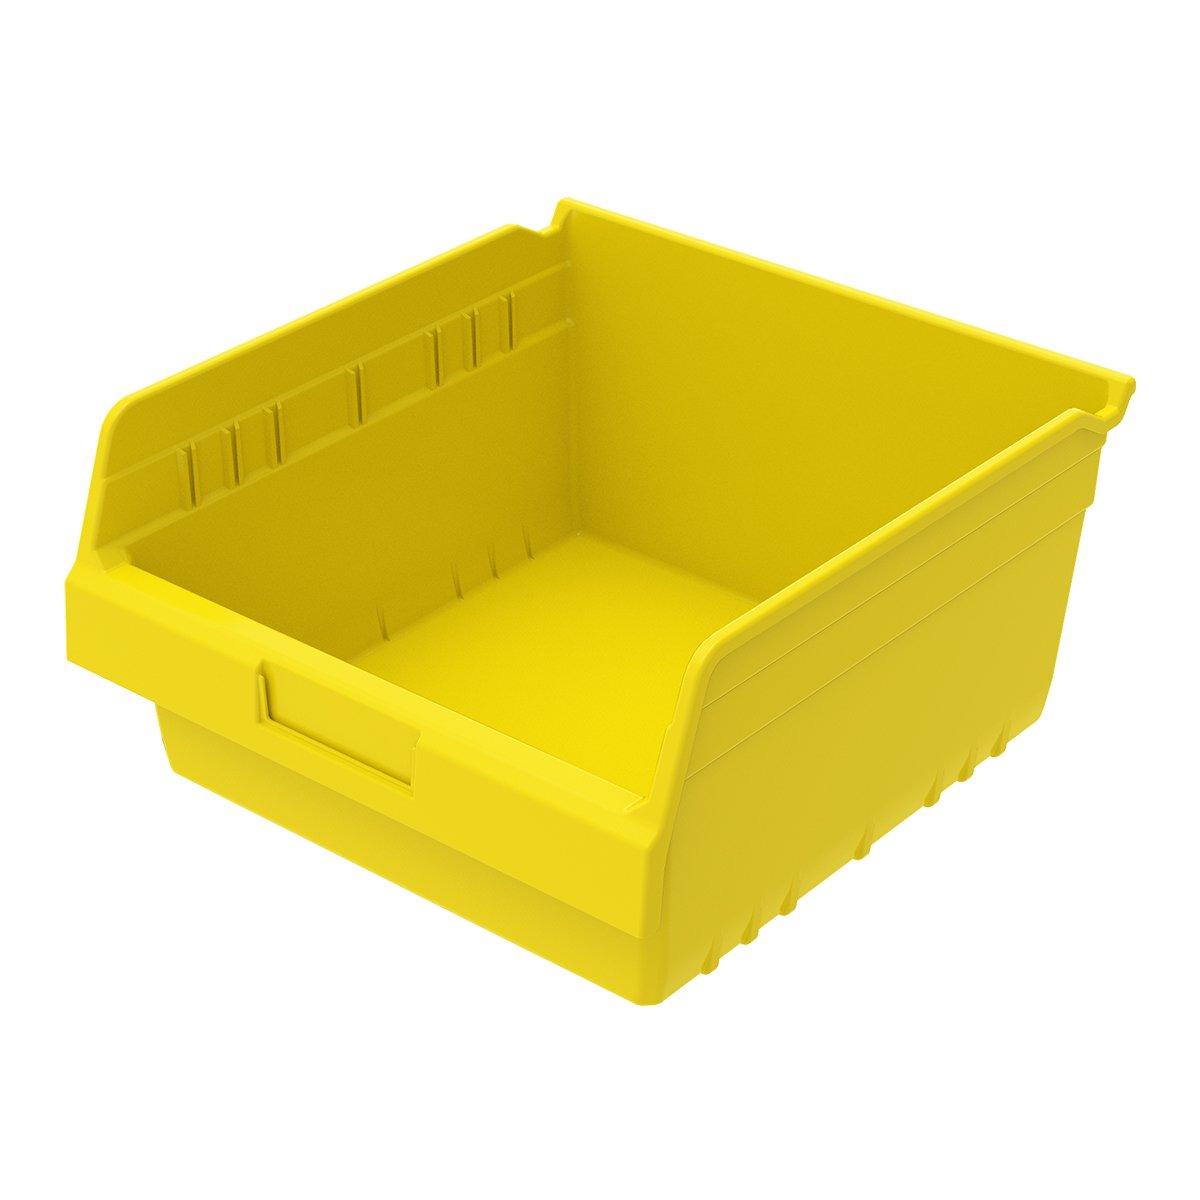 Akro-Mils 30010YELLO ShelfMax Plastic Nesting Shelf Bin Box, 11-5/8-Inch L x 11-1/8-Inch W x 6-Inch H,  Yellow,  8-Pack